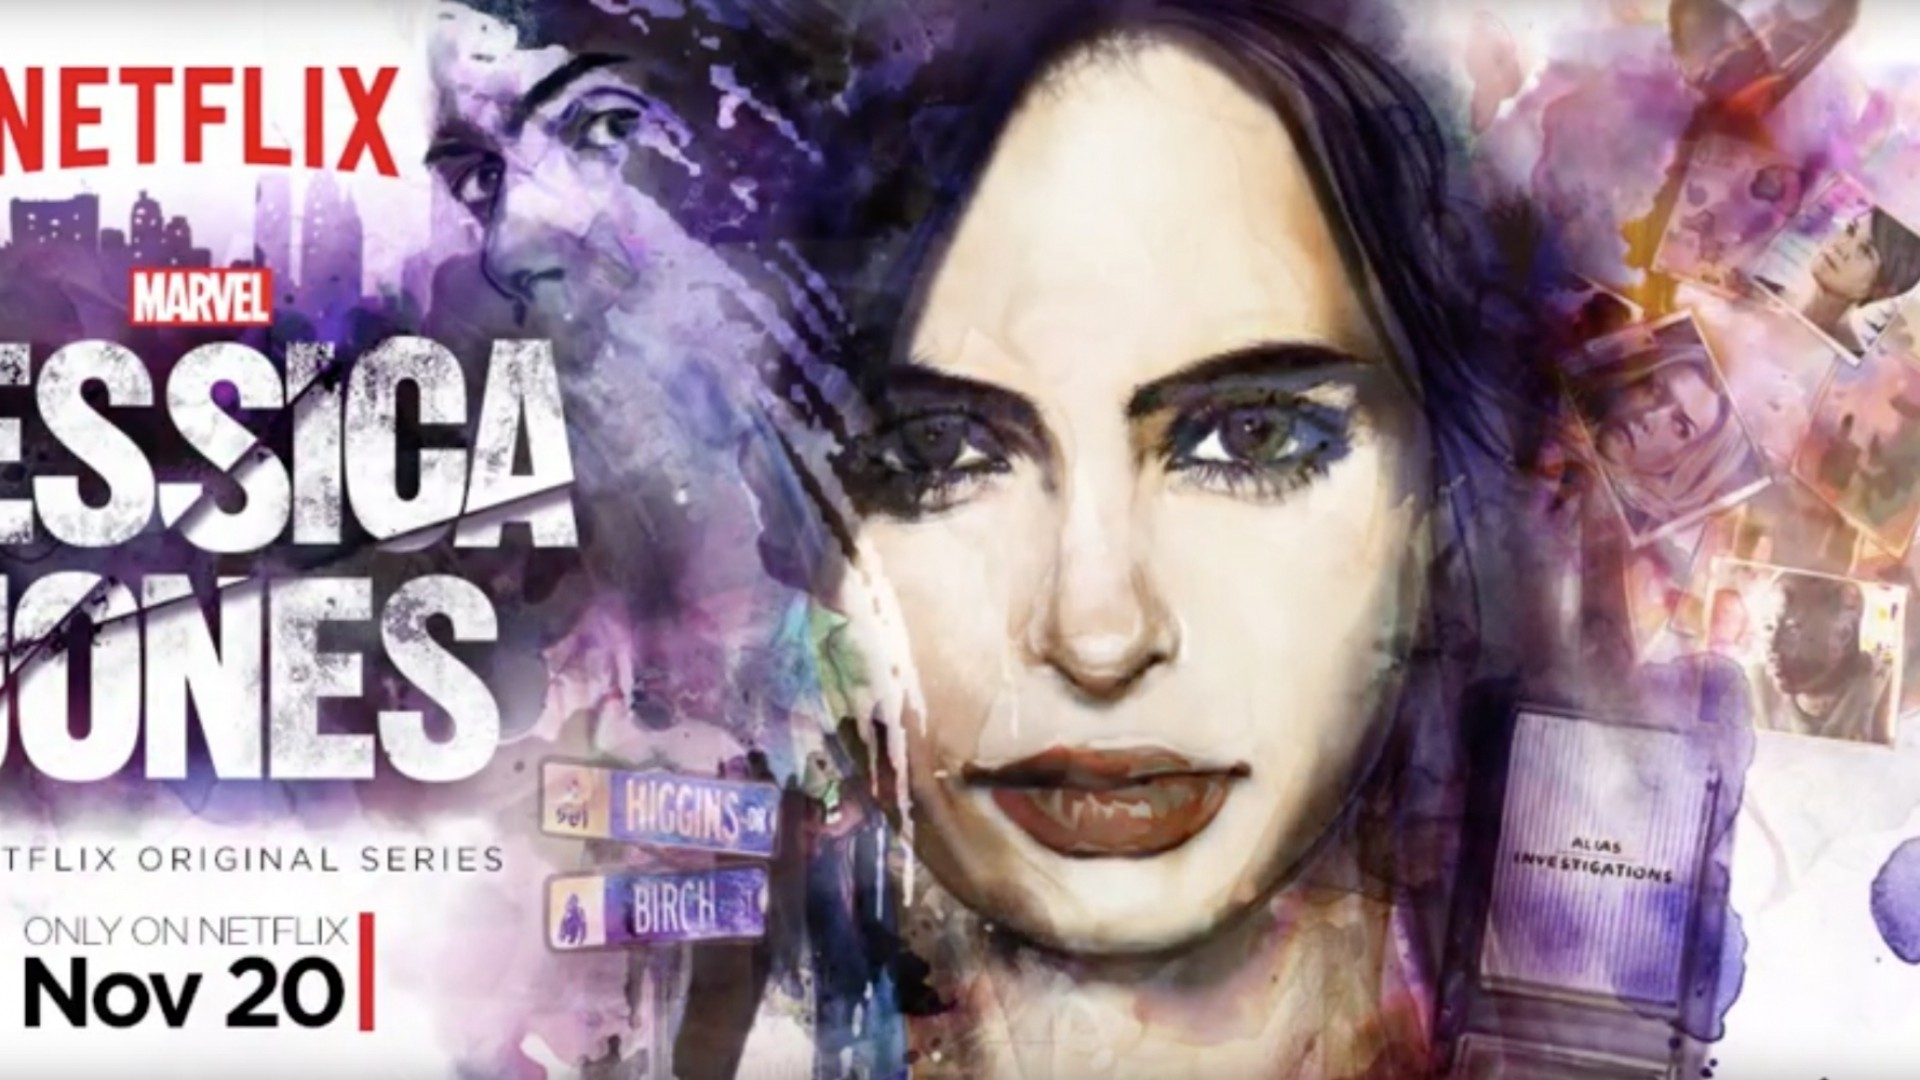 Jessica Jones Wallpaper ·① Download Free Amazing HD